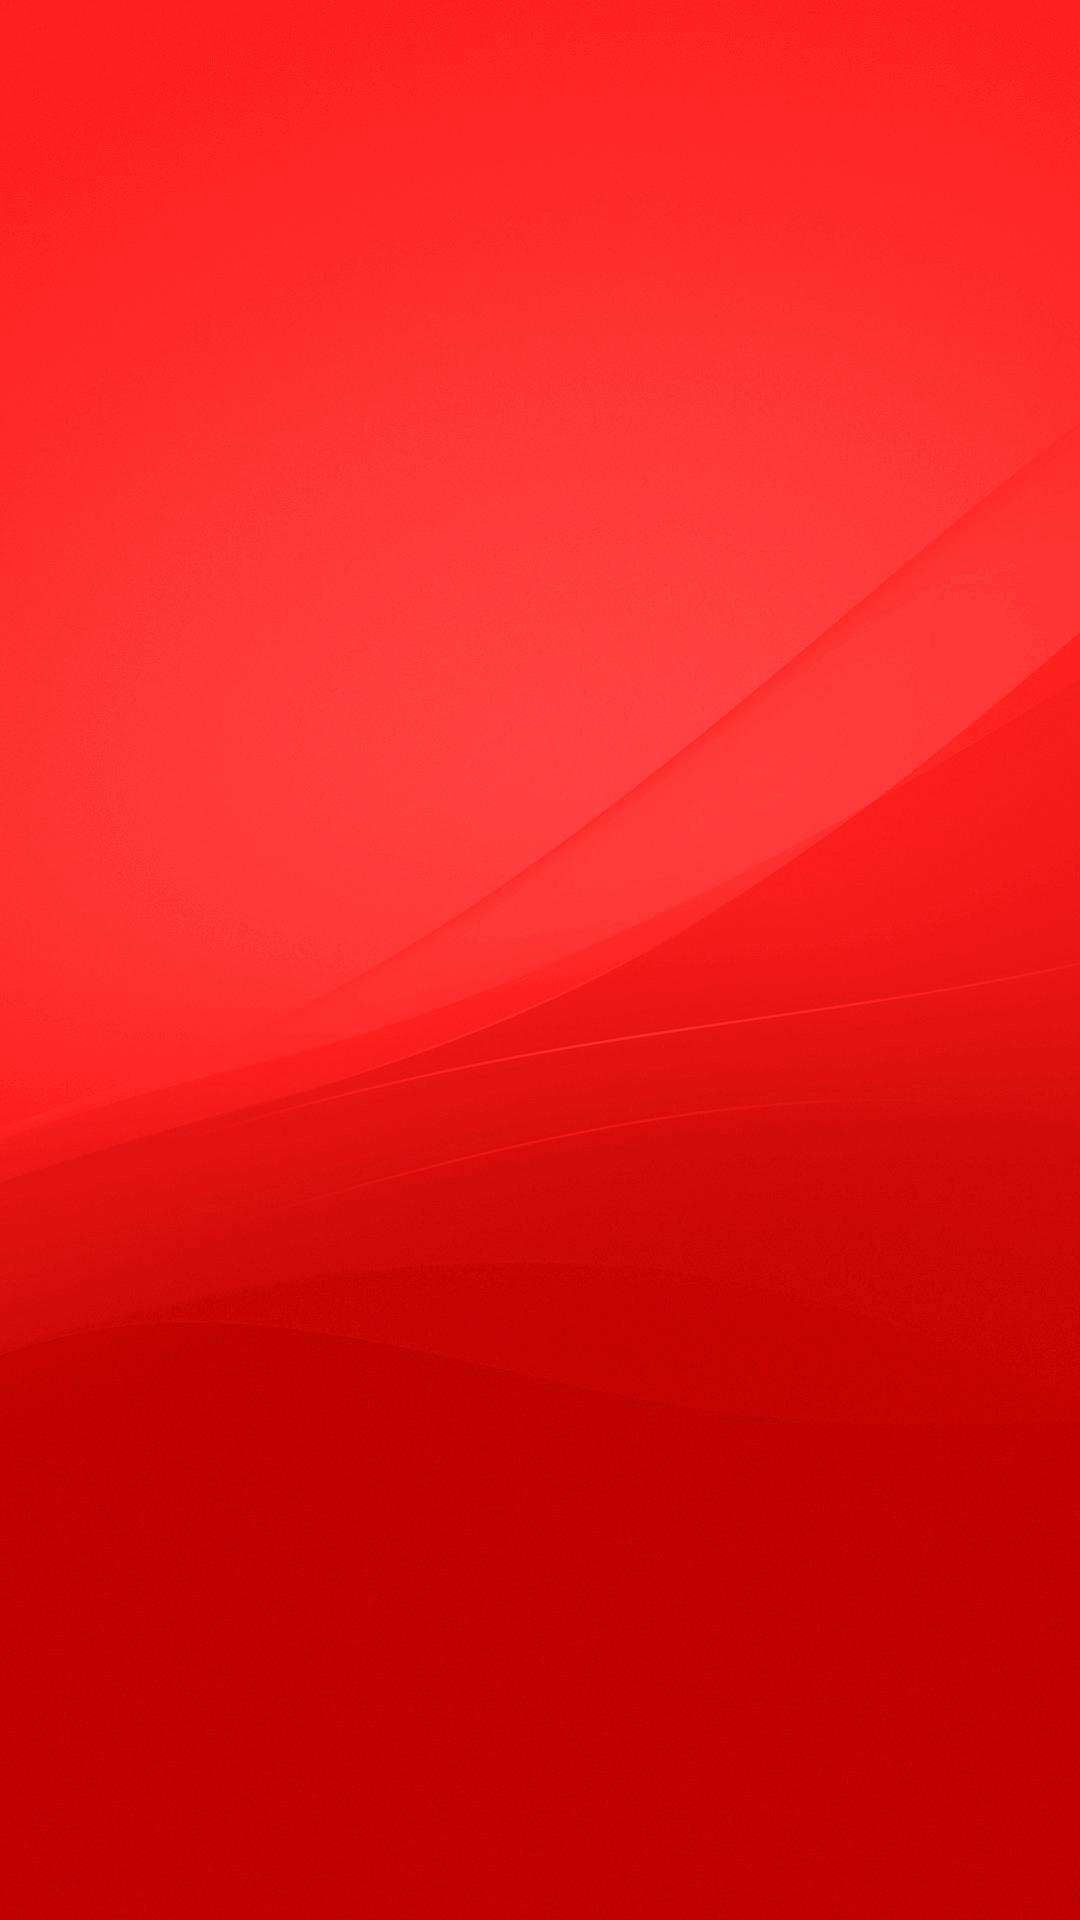 Xperia Lollipop Red Wallpaper Gizmo Bolt Exposing